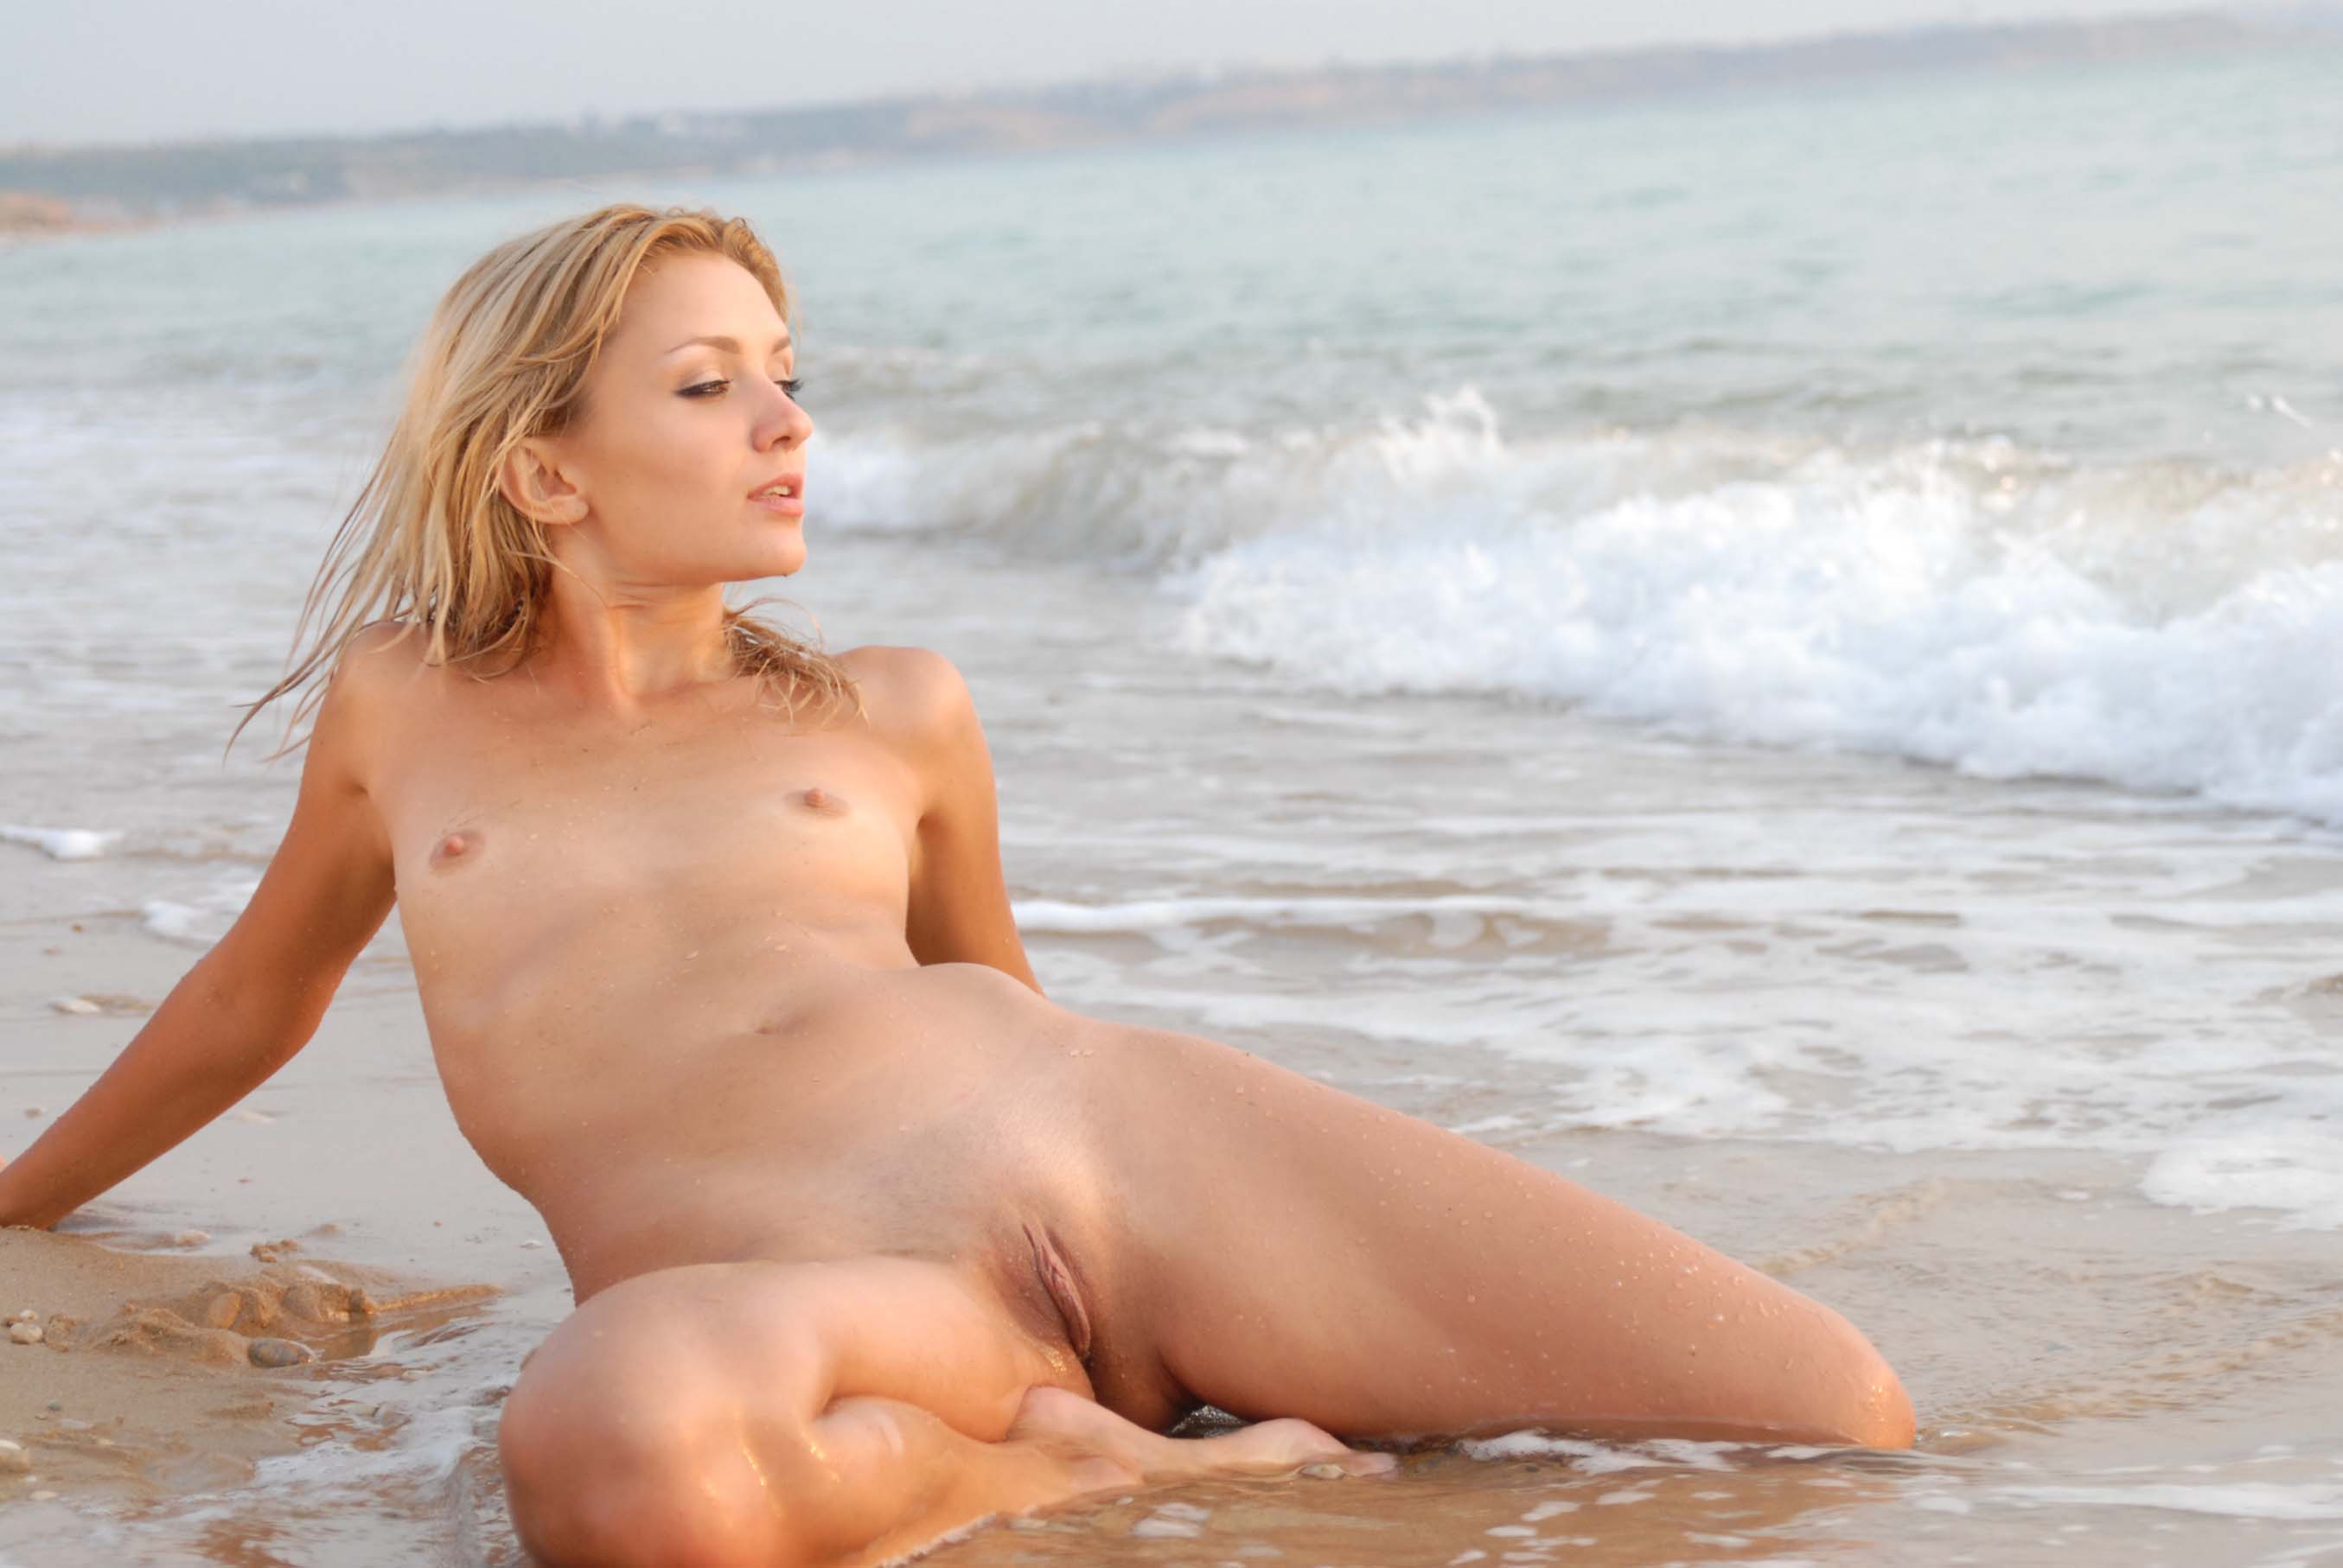 море телки фото голых-йц1